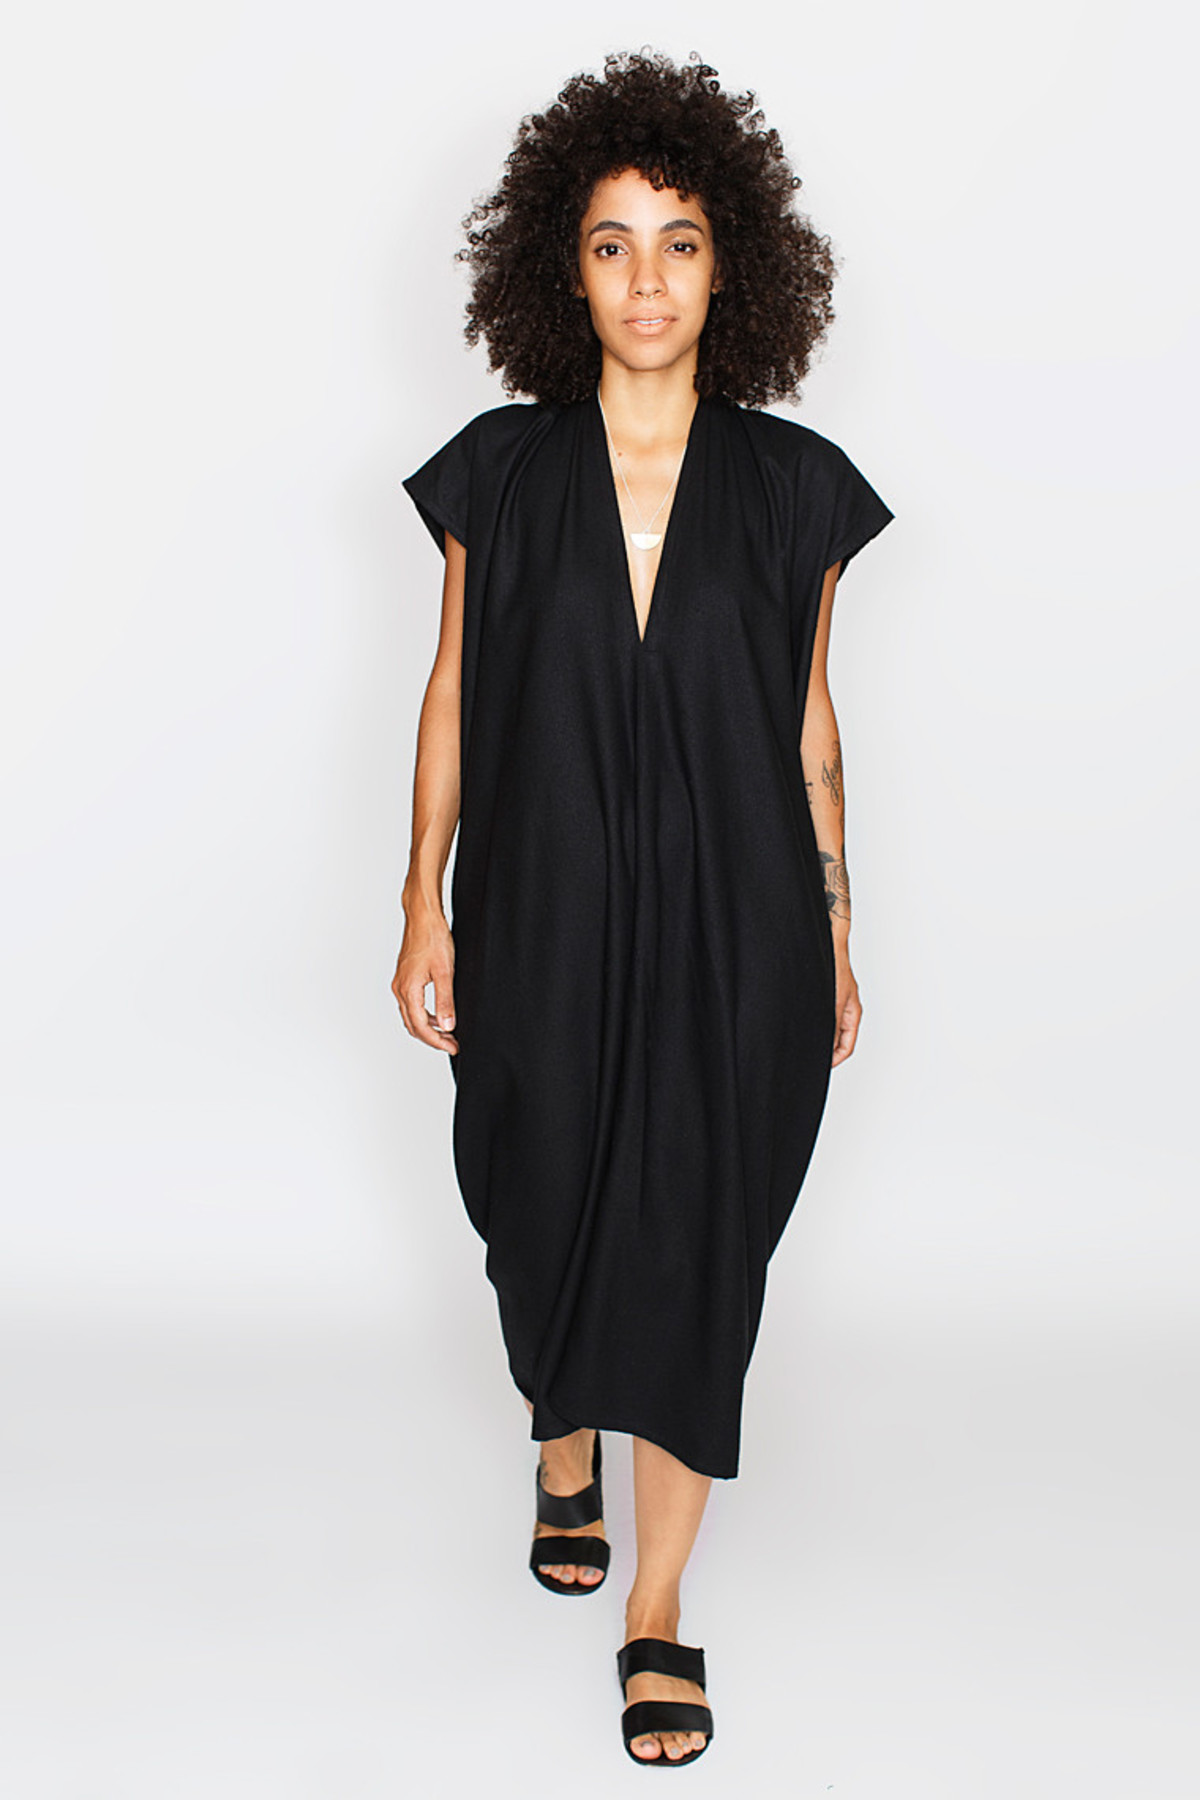 Black everyday dress